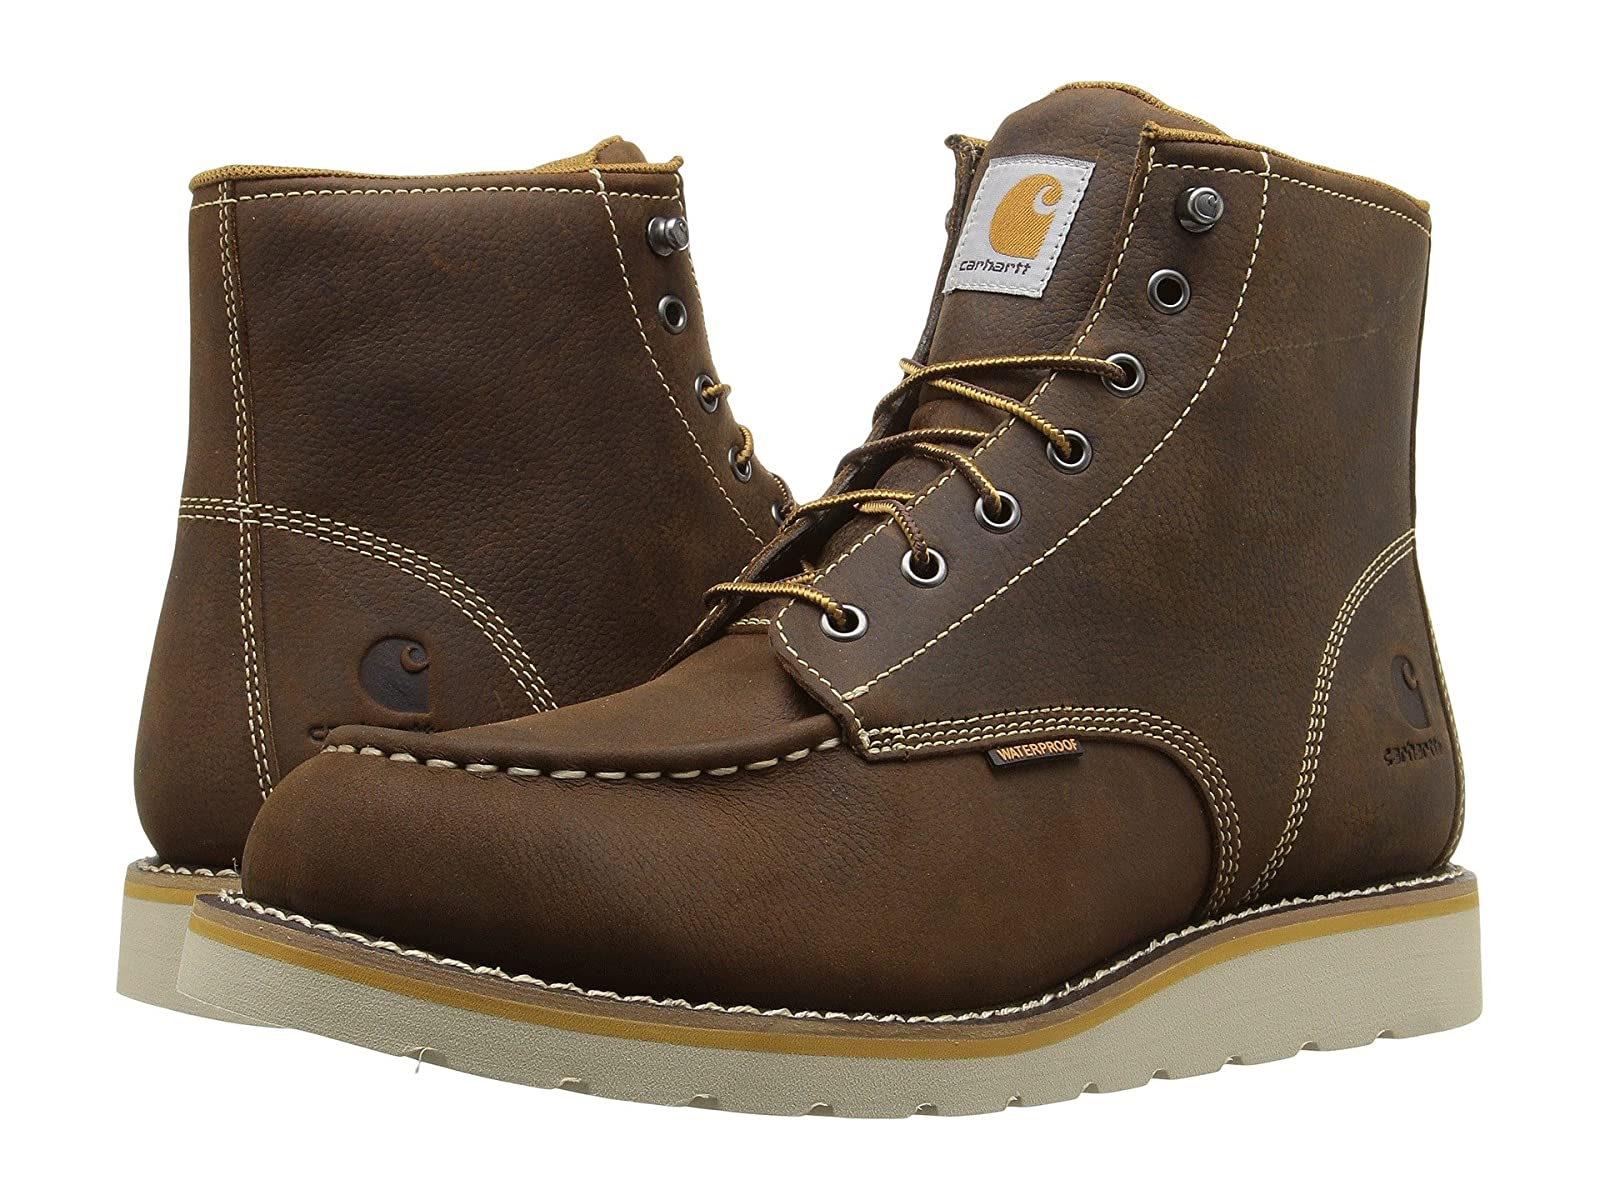 "Carhartt 6"" Waterproof Wedge Boot Boot Boot 50bcbe"